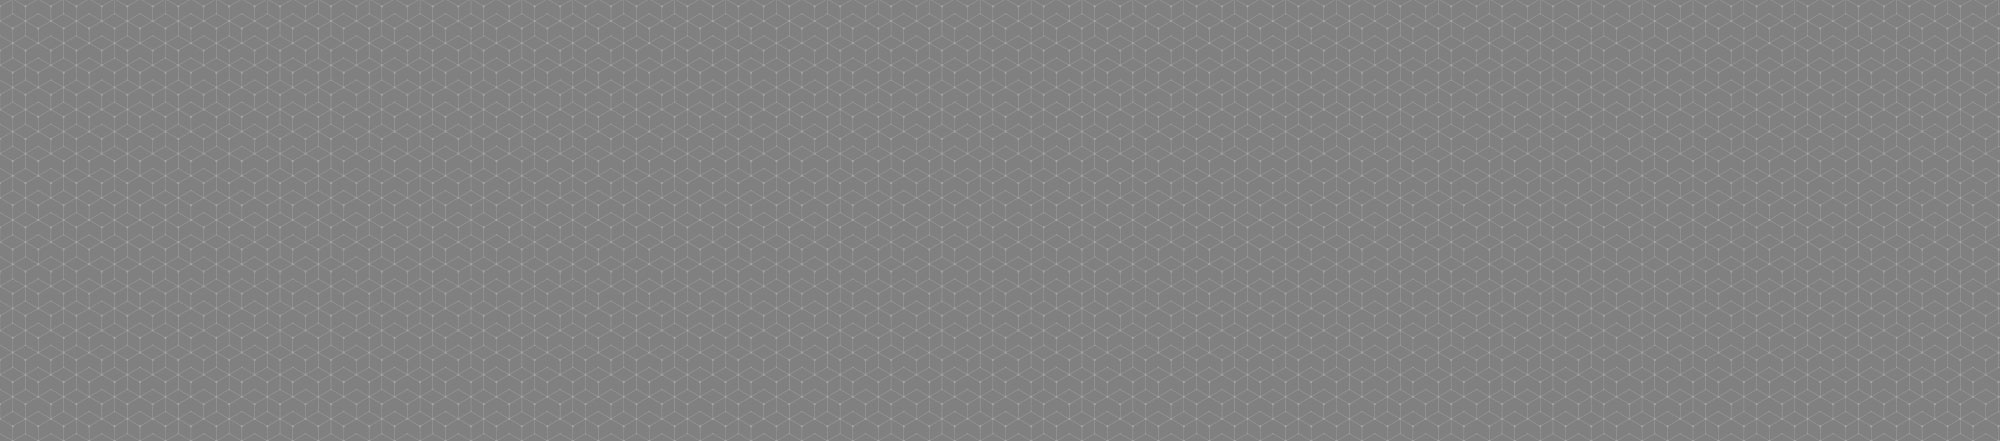 New-Pattern.jpg